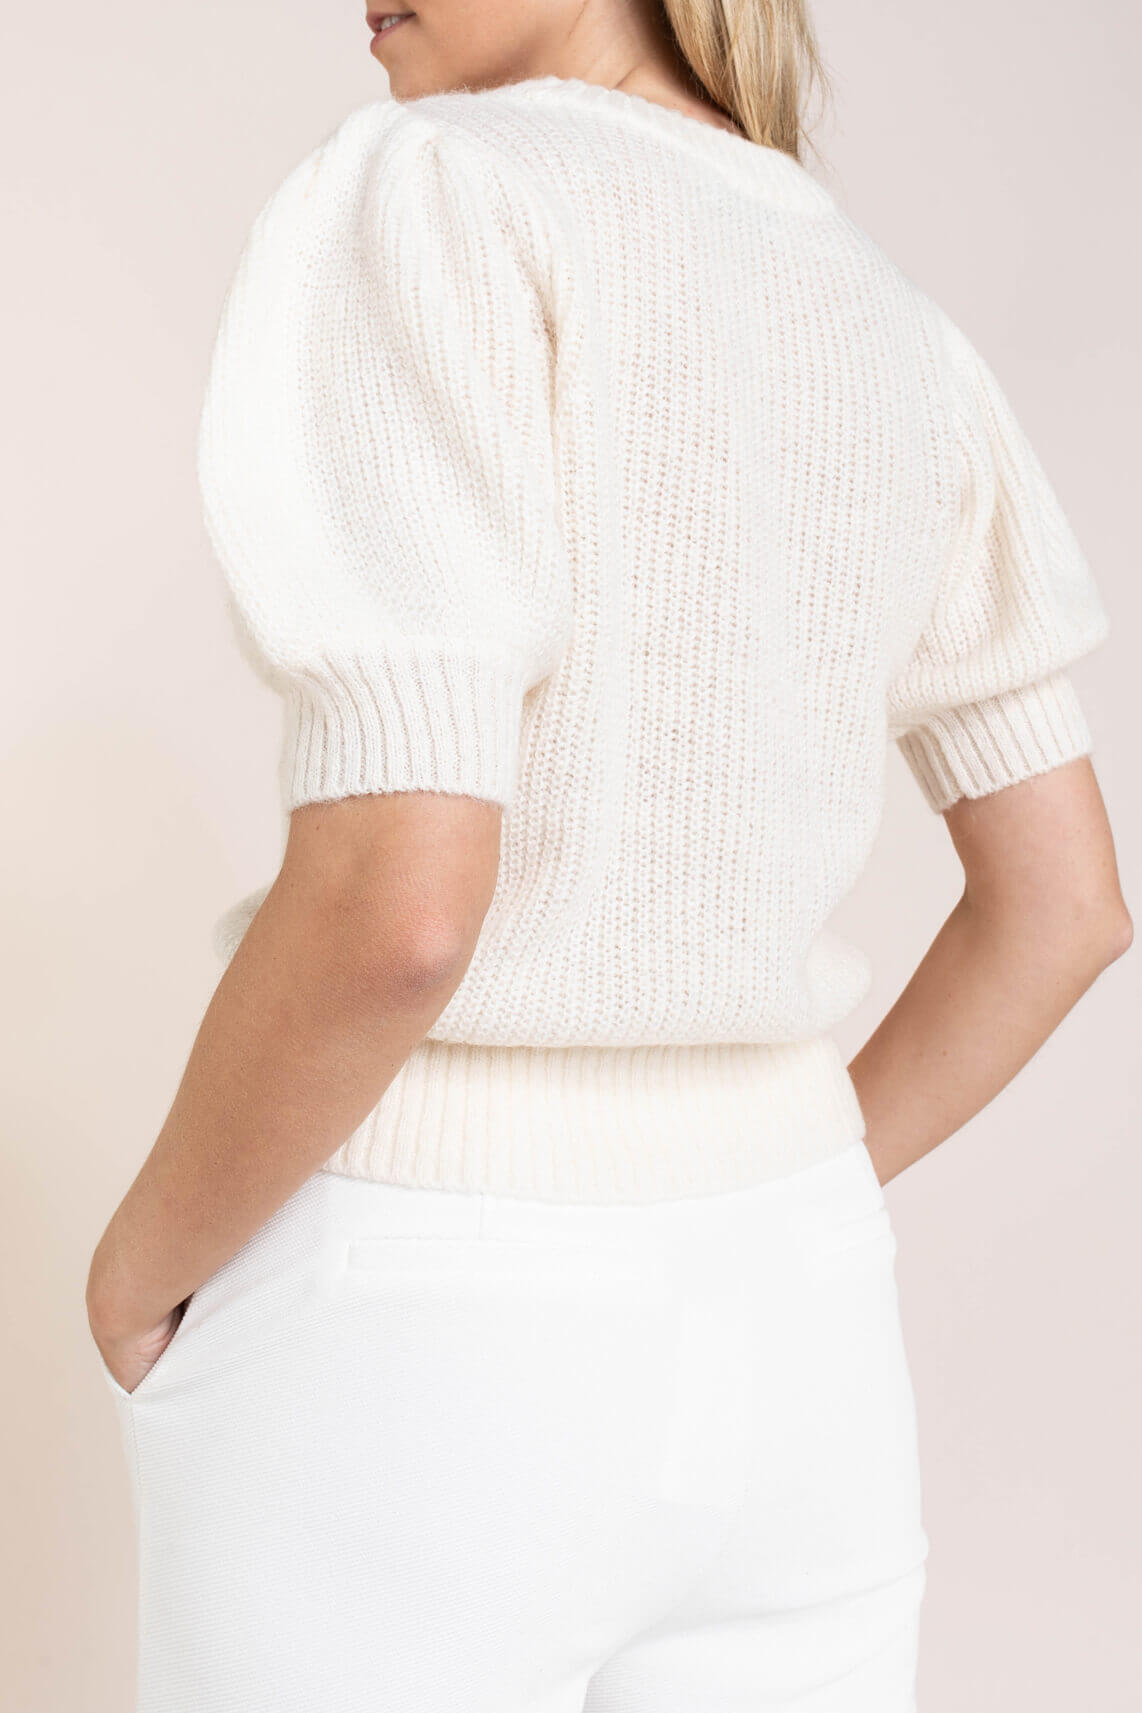 Copenhagen Muse Dames Diva pullover Geel